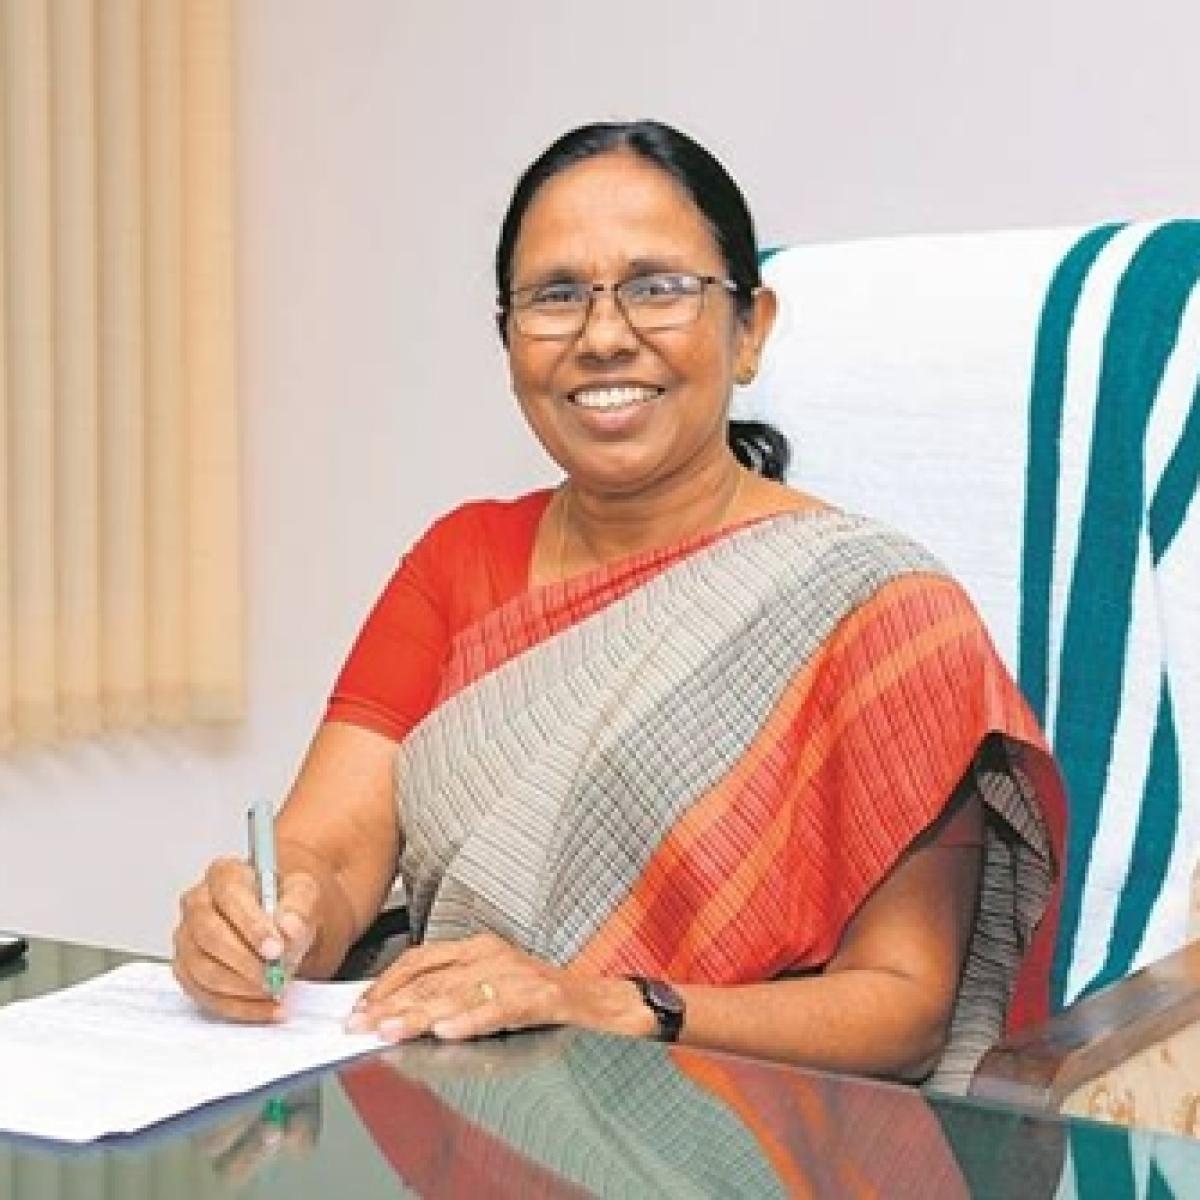 Kerala: As CM Pinarayi Vijayan drops KK Shailaja from new cabinet, here's what ex-health minister has to say